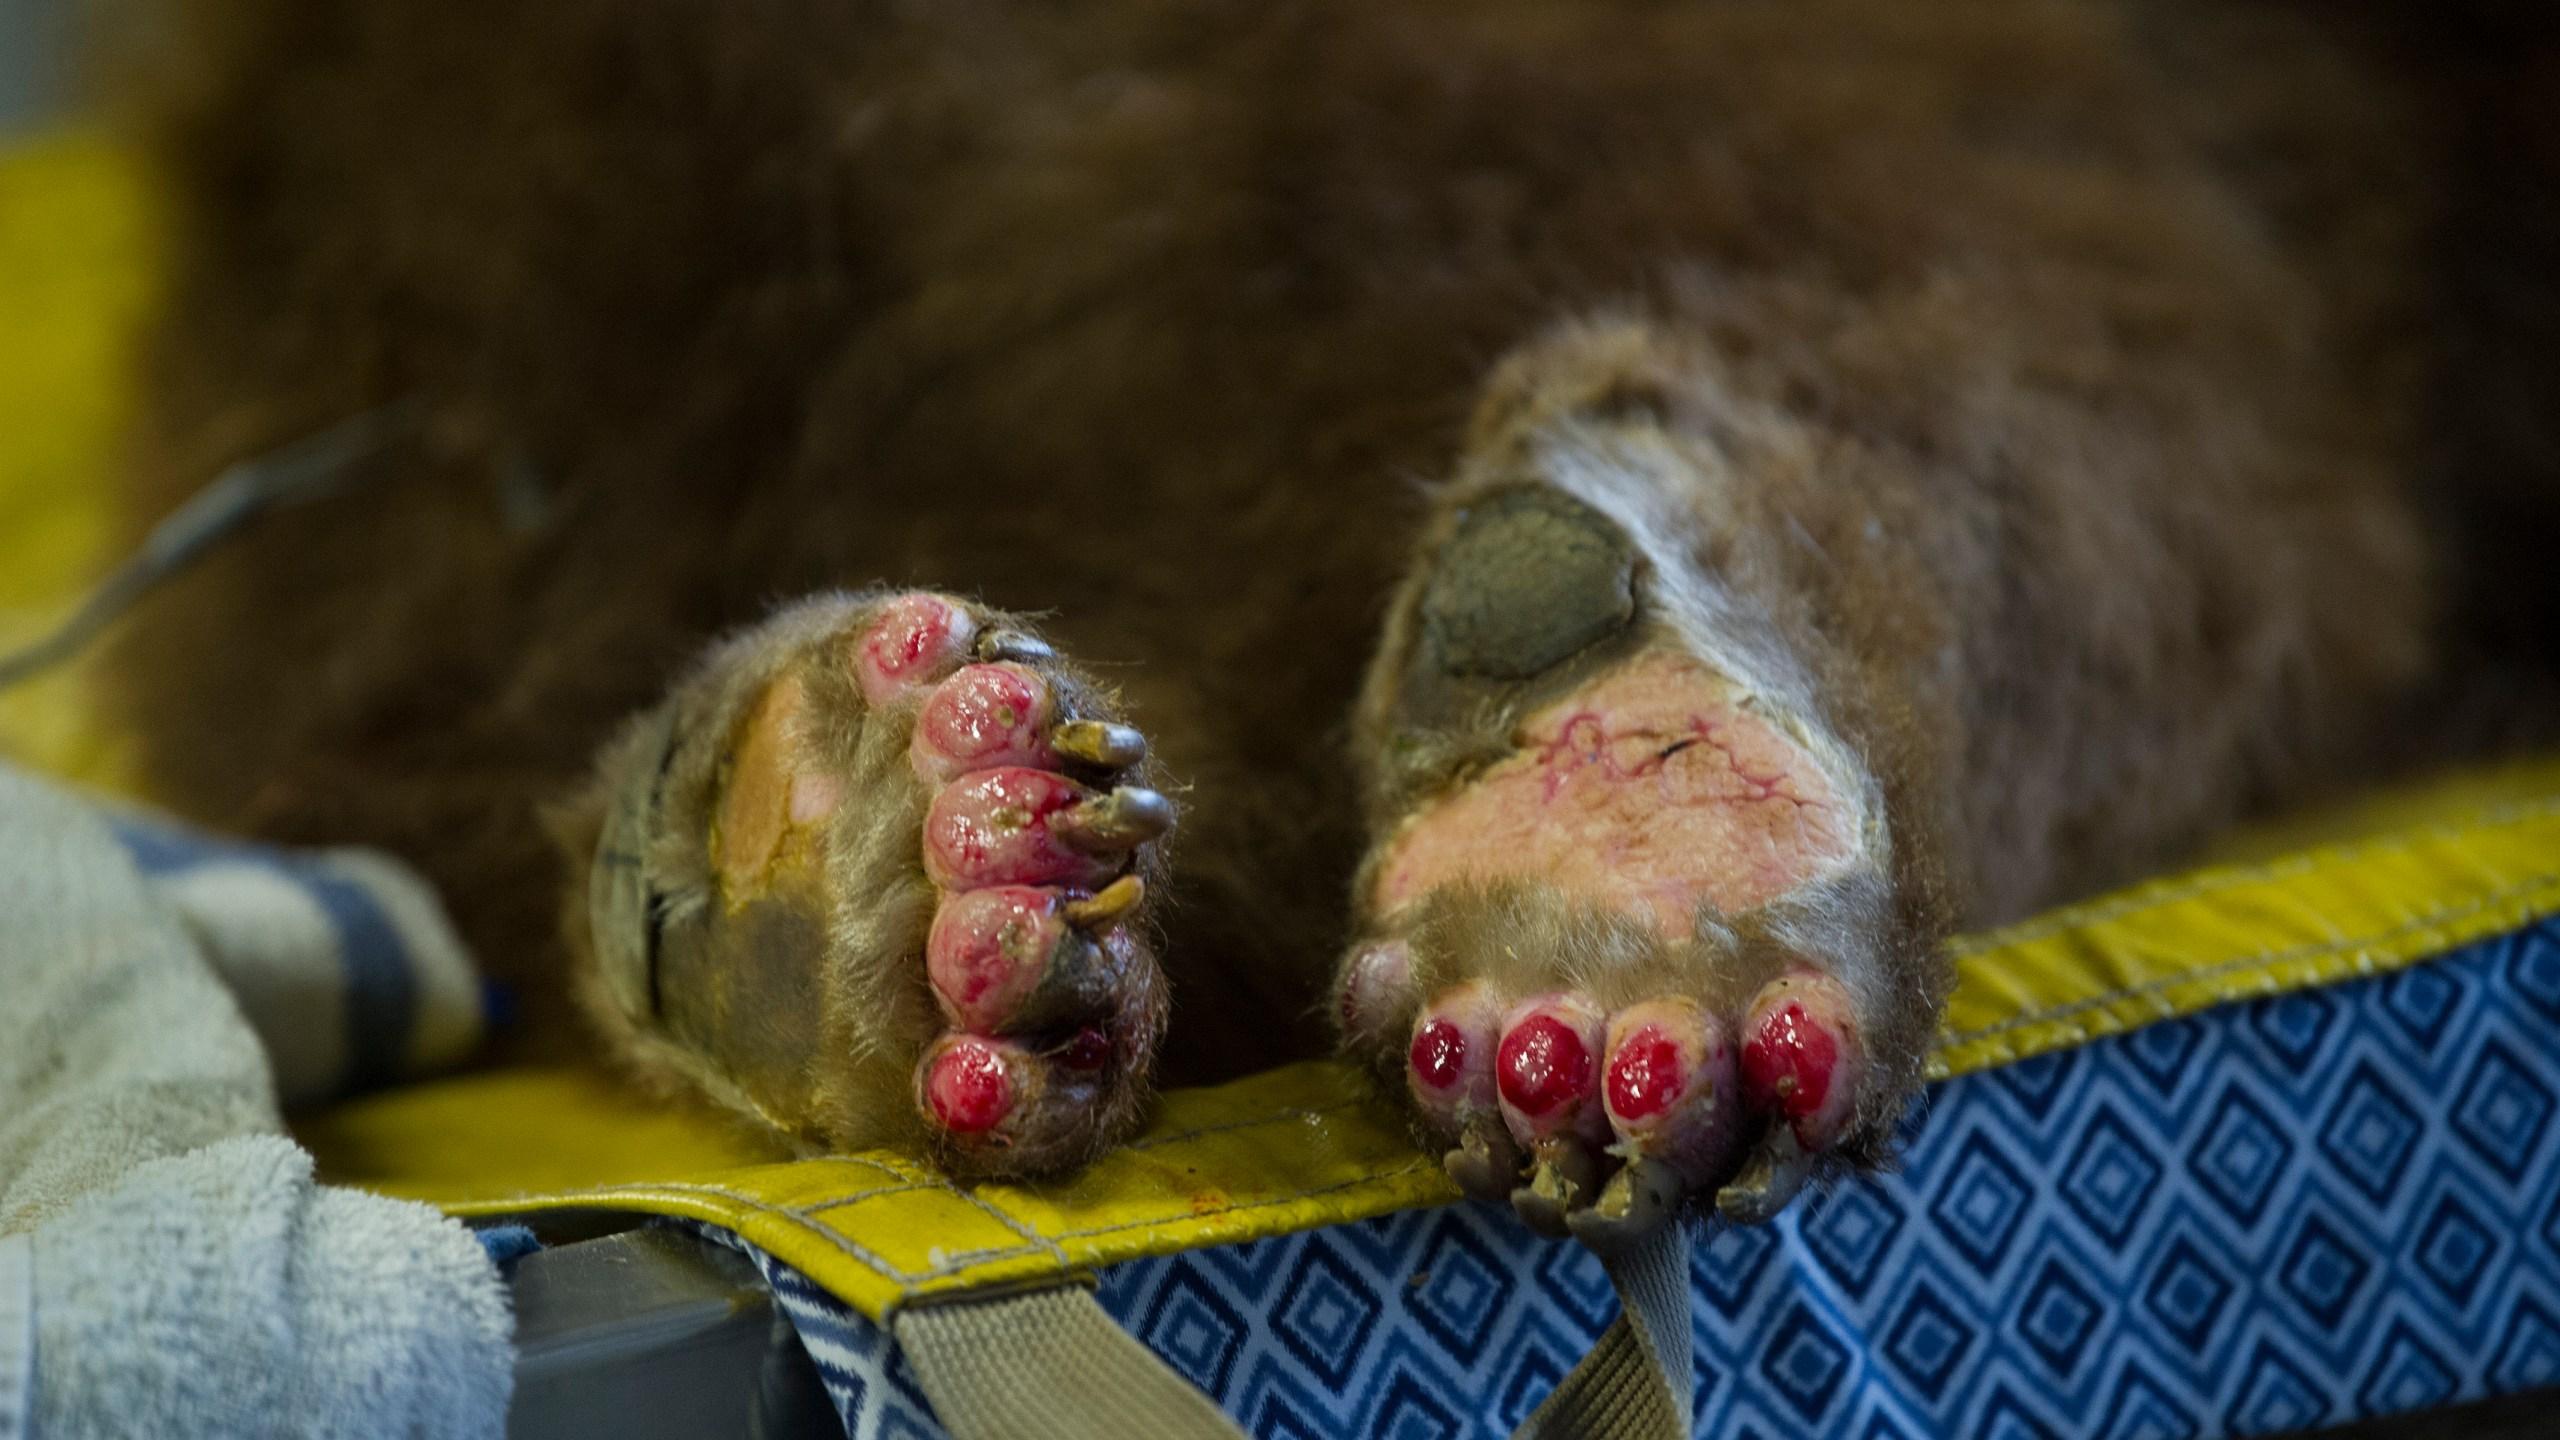 Bear brought to CDFW Wildlife Investigations Lab has severe third-degree burns on its paw. (Credit: Karin Higgins / UC Davis)